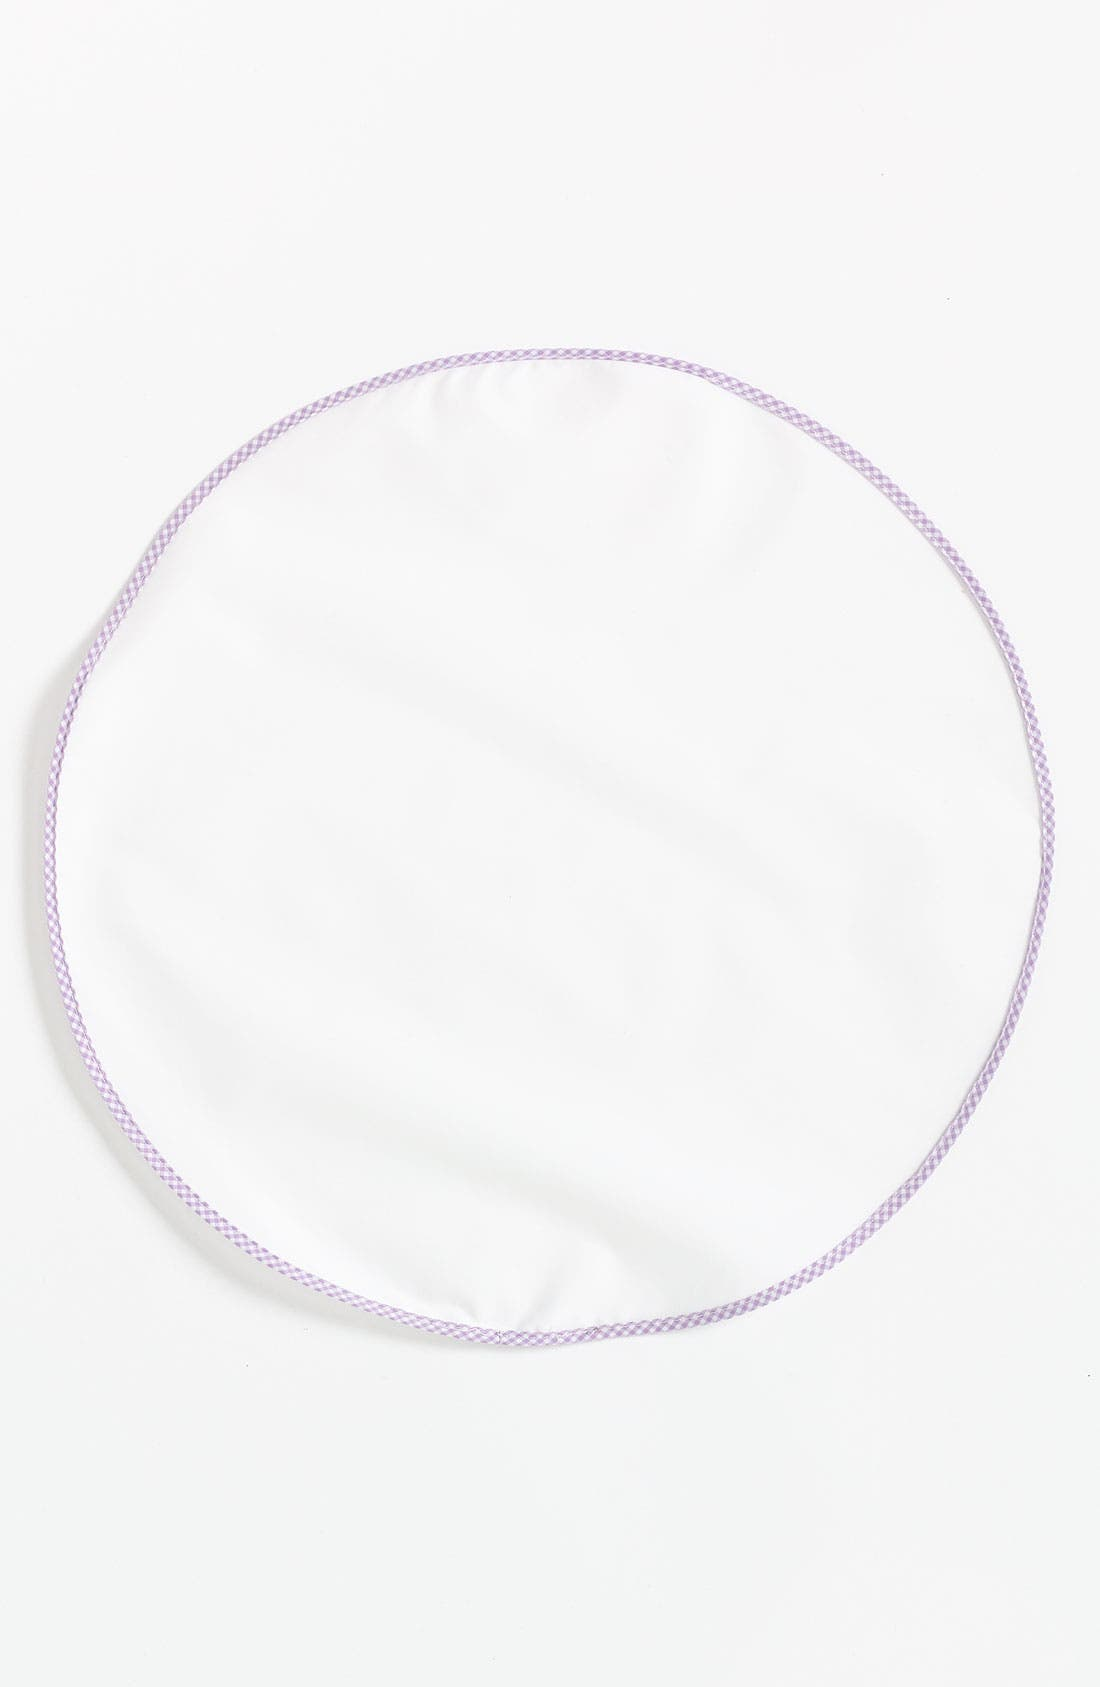 Alternate Image 1 Selected - Edward Armah Circular Pocket Square